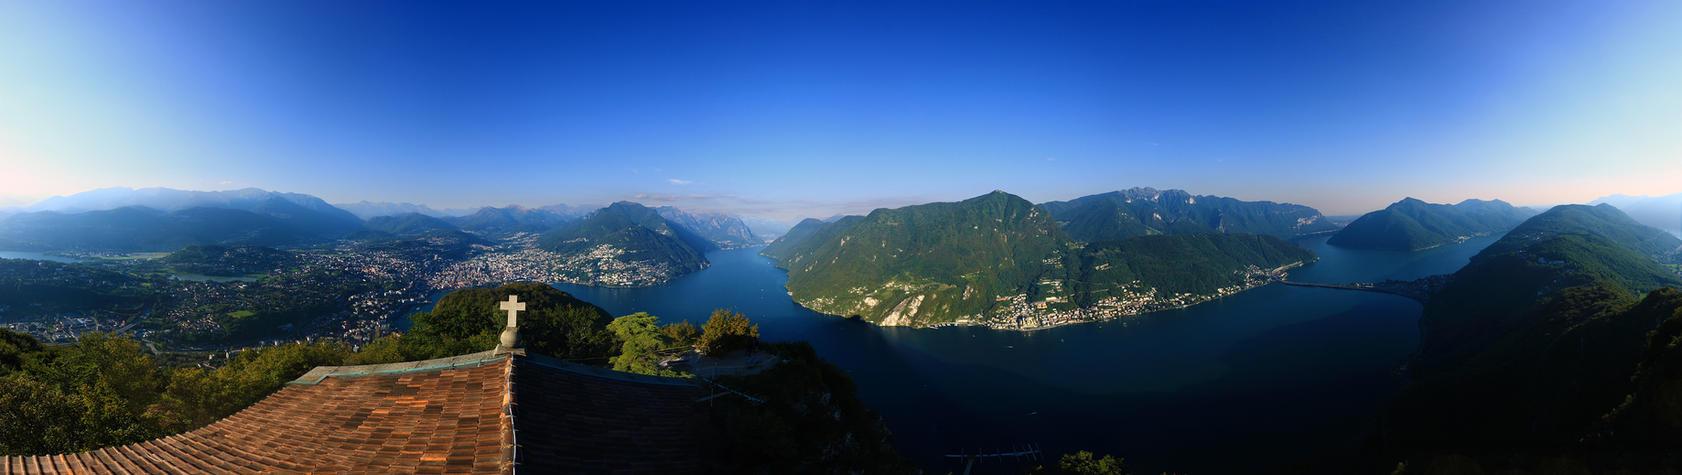 Lugano Panorama by dmakreshanski